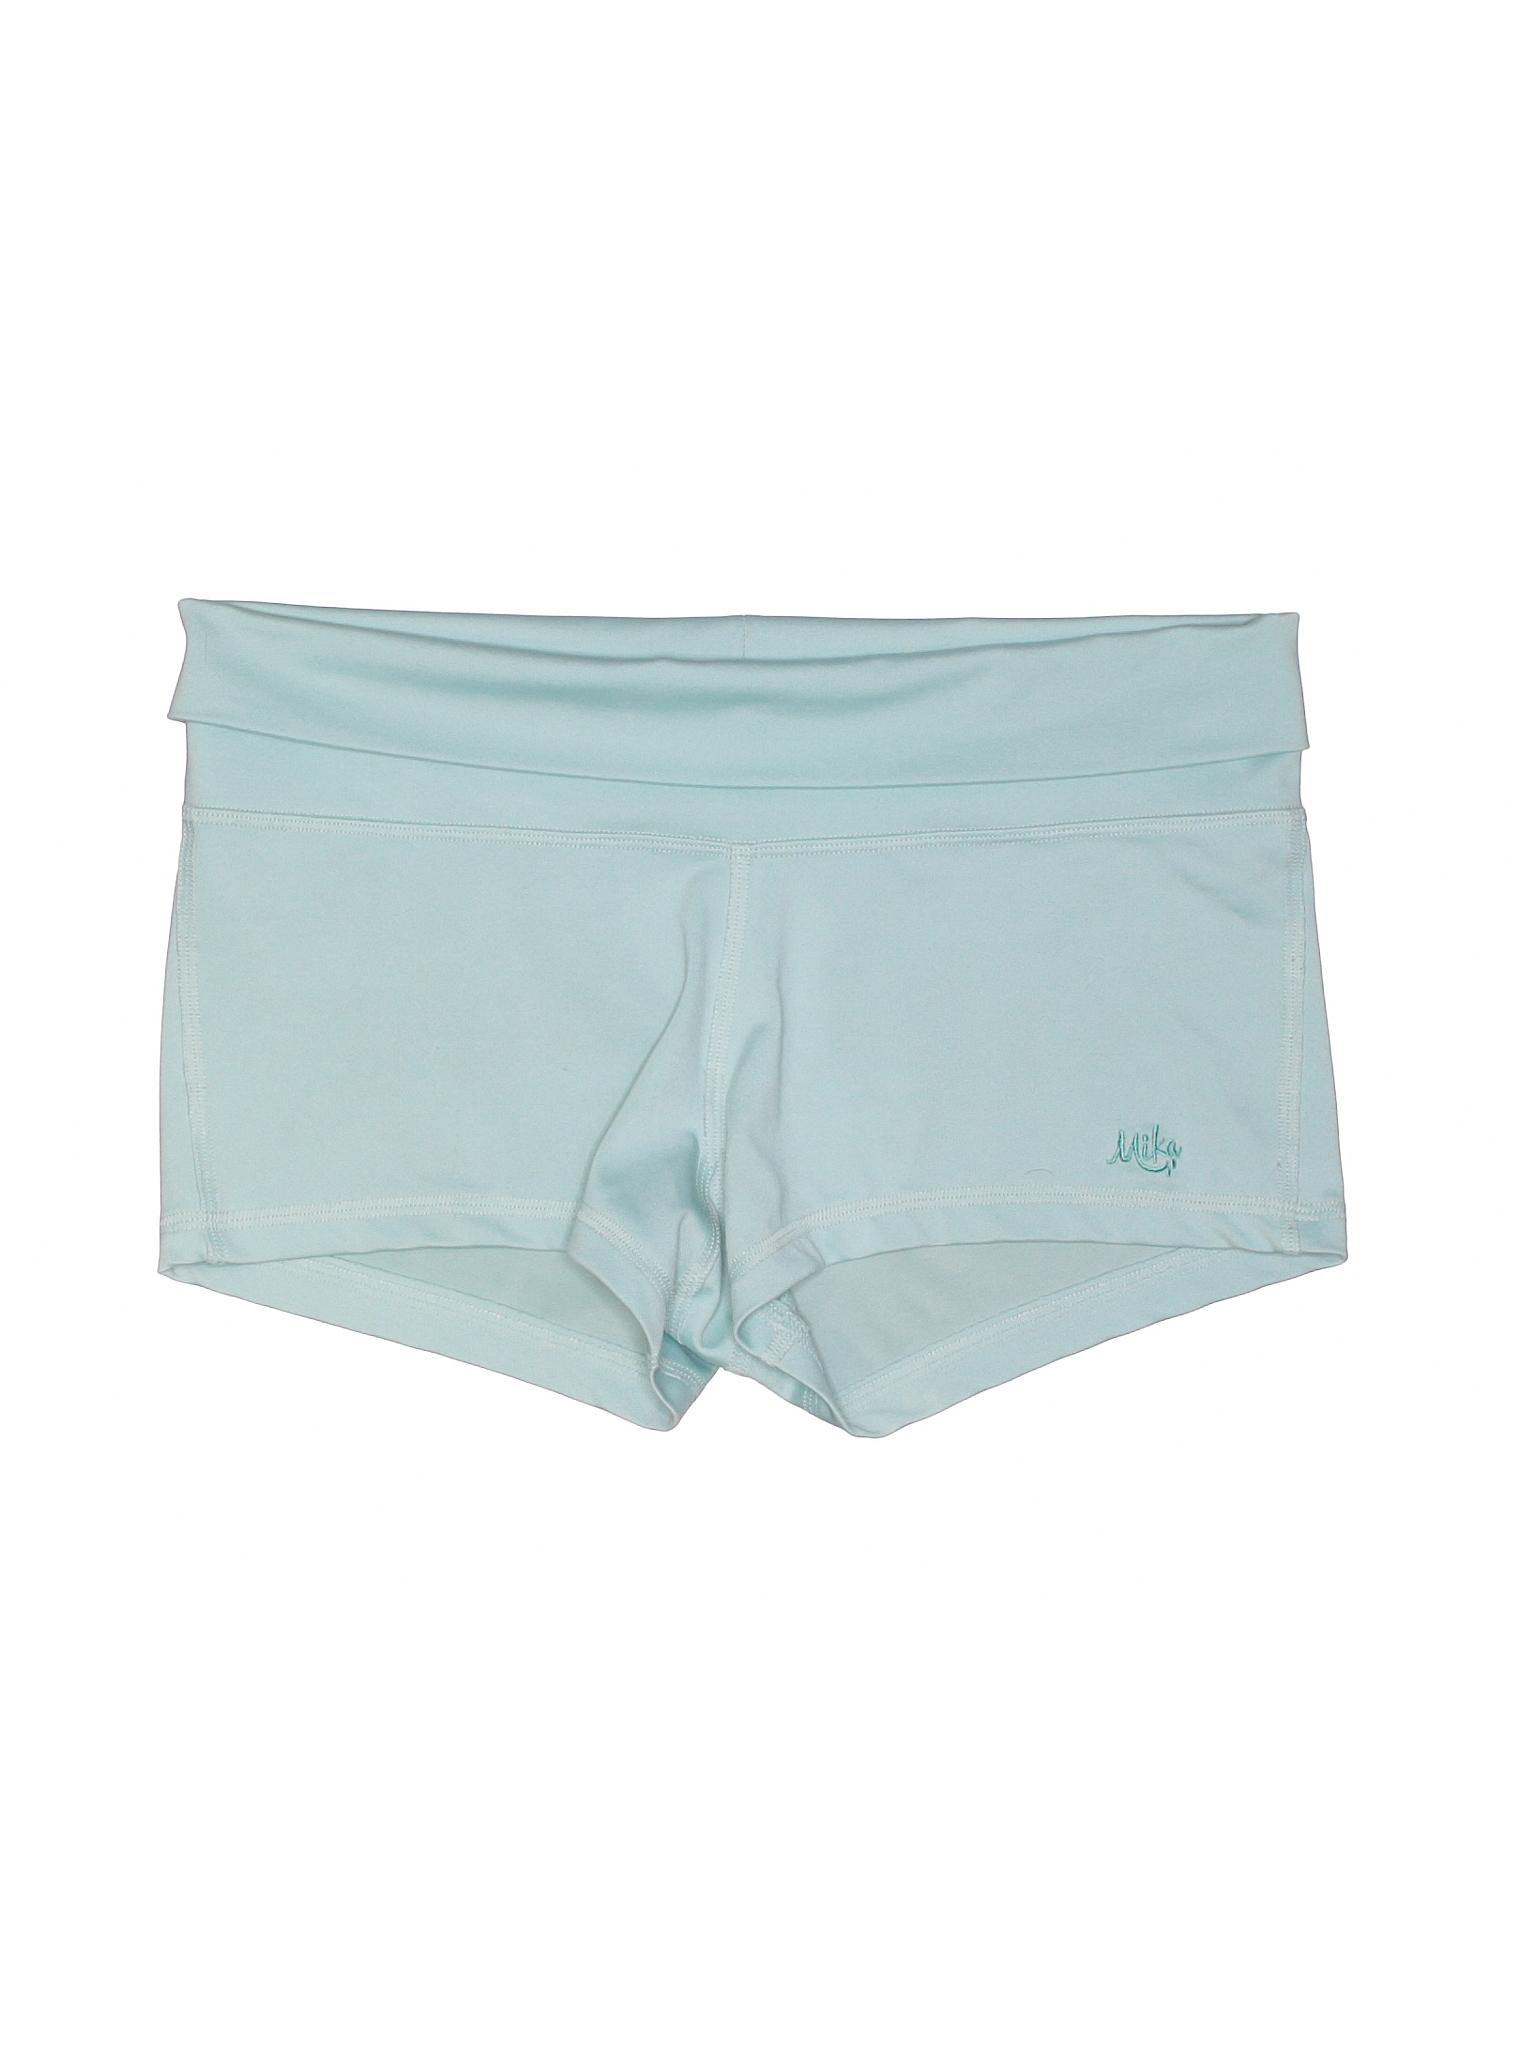 Shorts Mika Athletic Boutique Athletic Boutique Mika Athletic Shorts Boutique Shorts Mika q7fdRctw